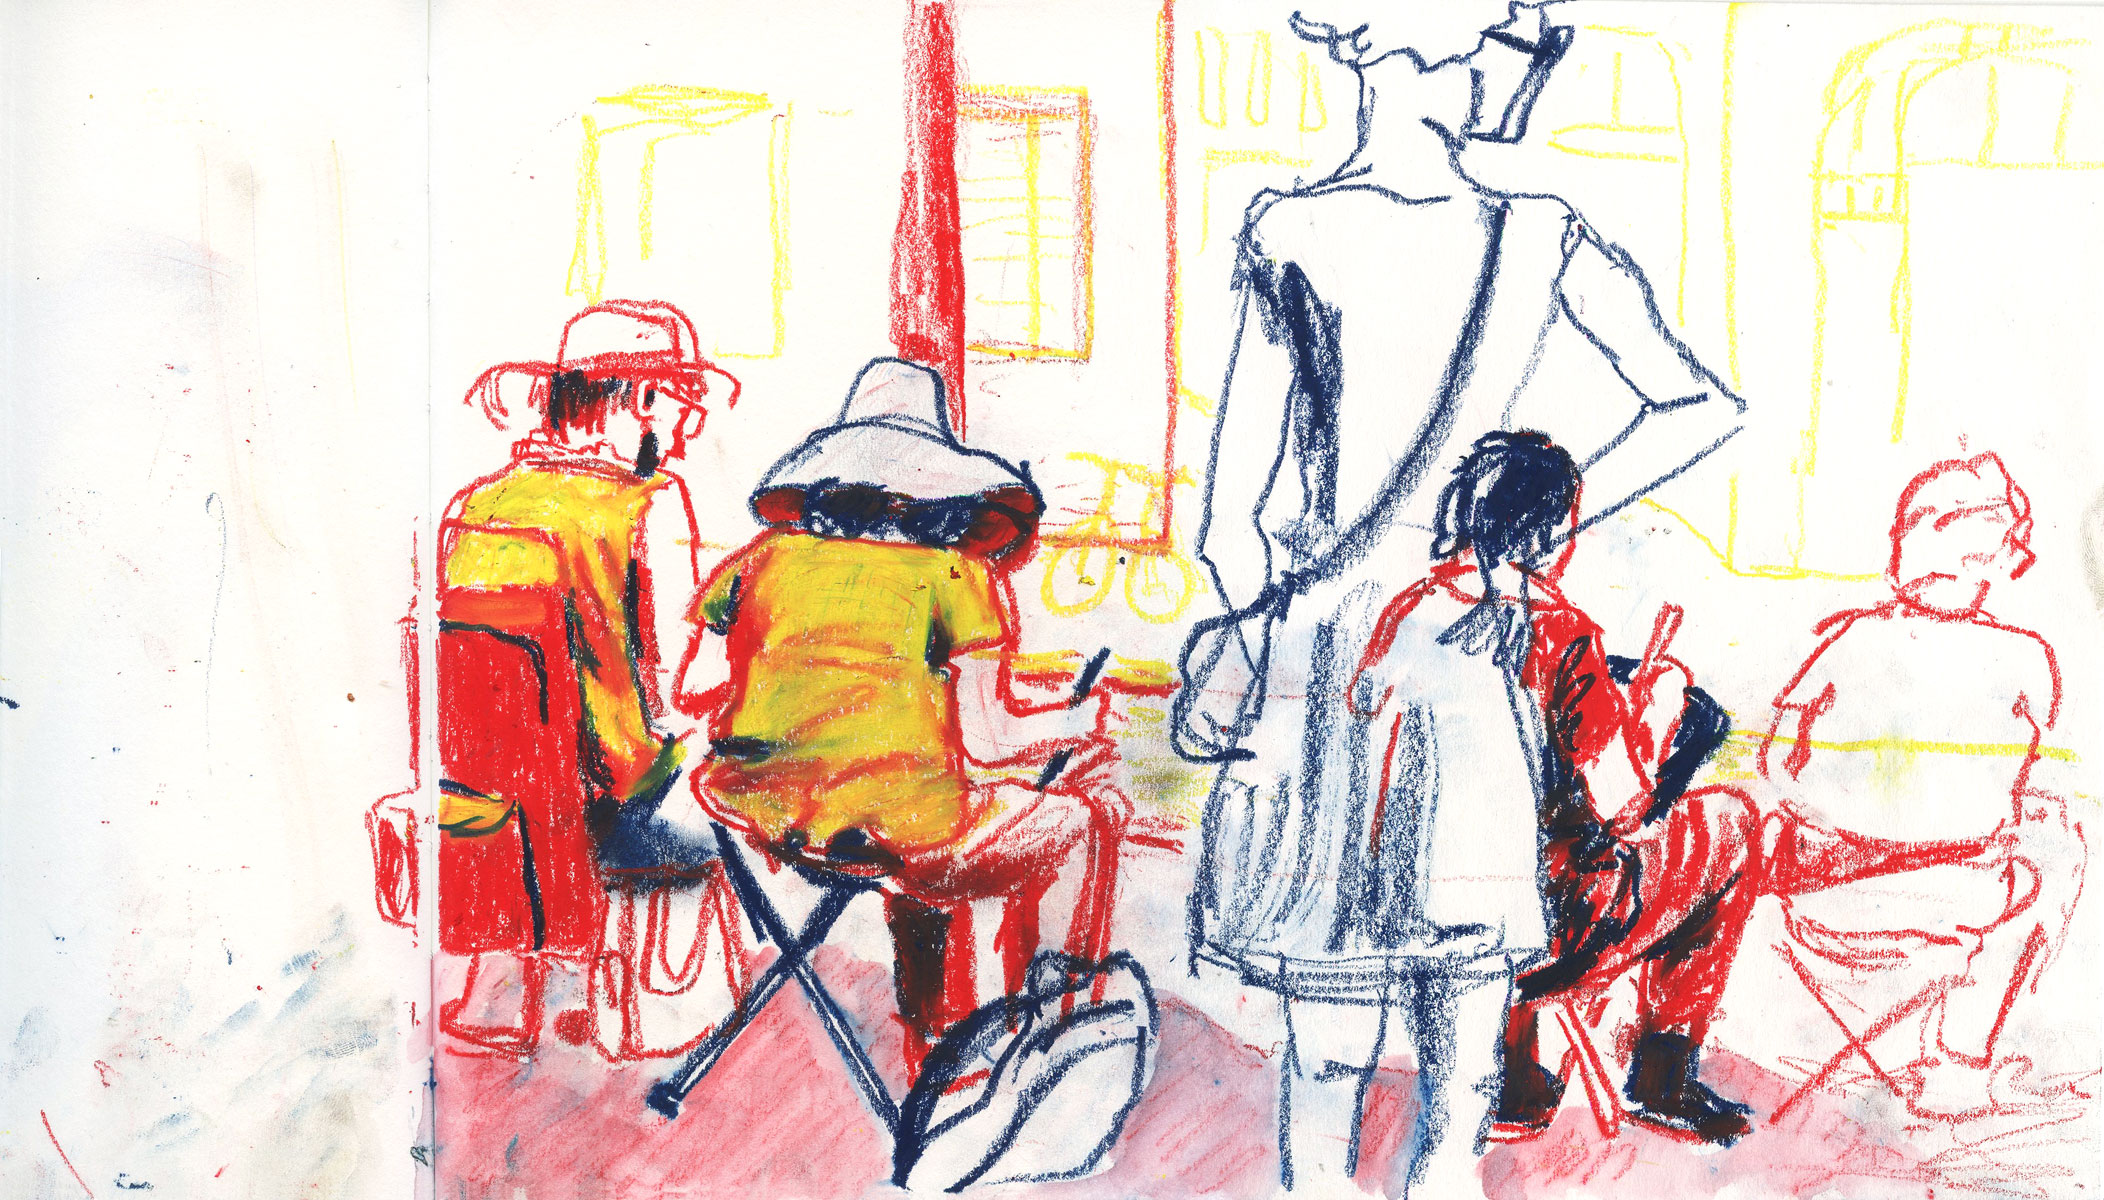 Illustration of Urban Sketchers at Amsterdam by Ellen Vesters picture book illustrator